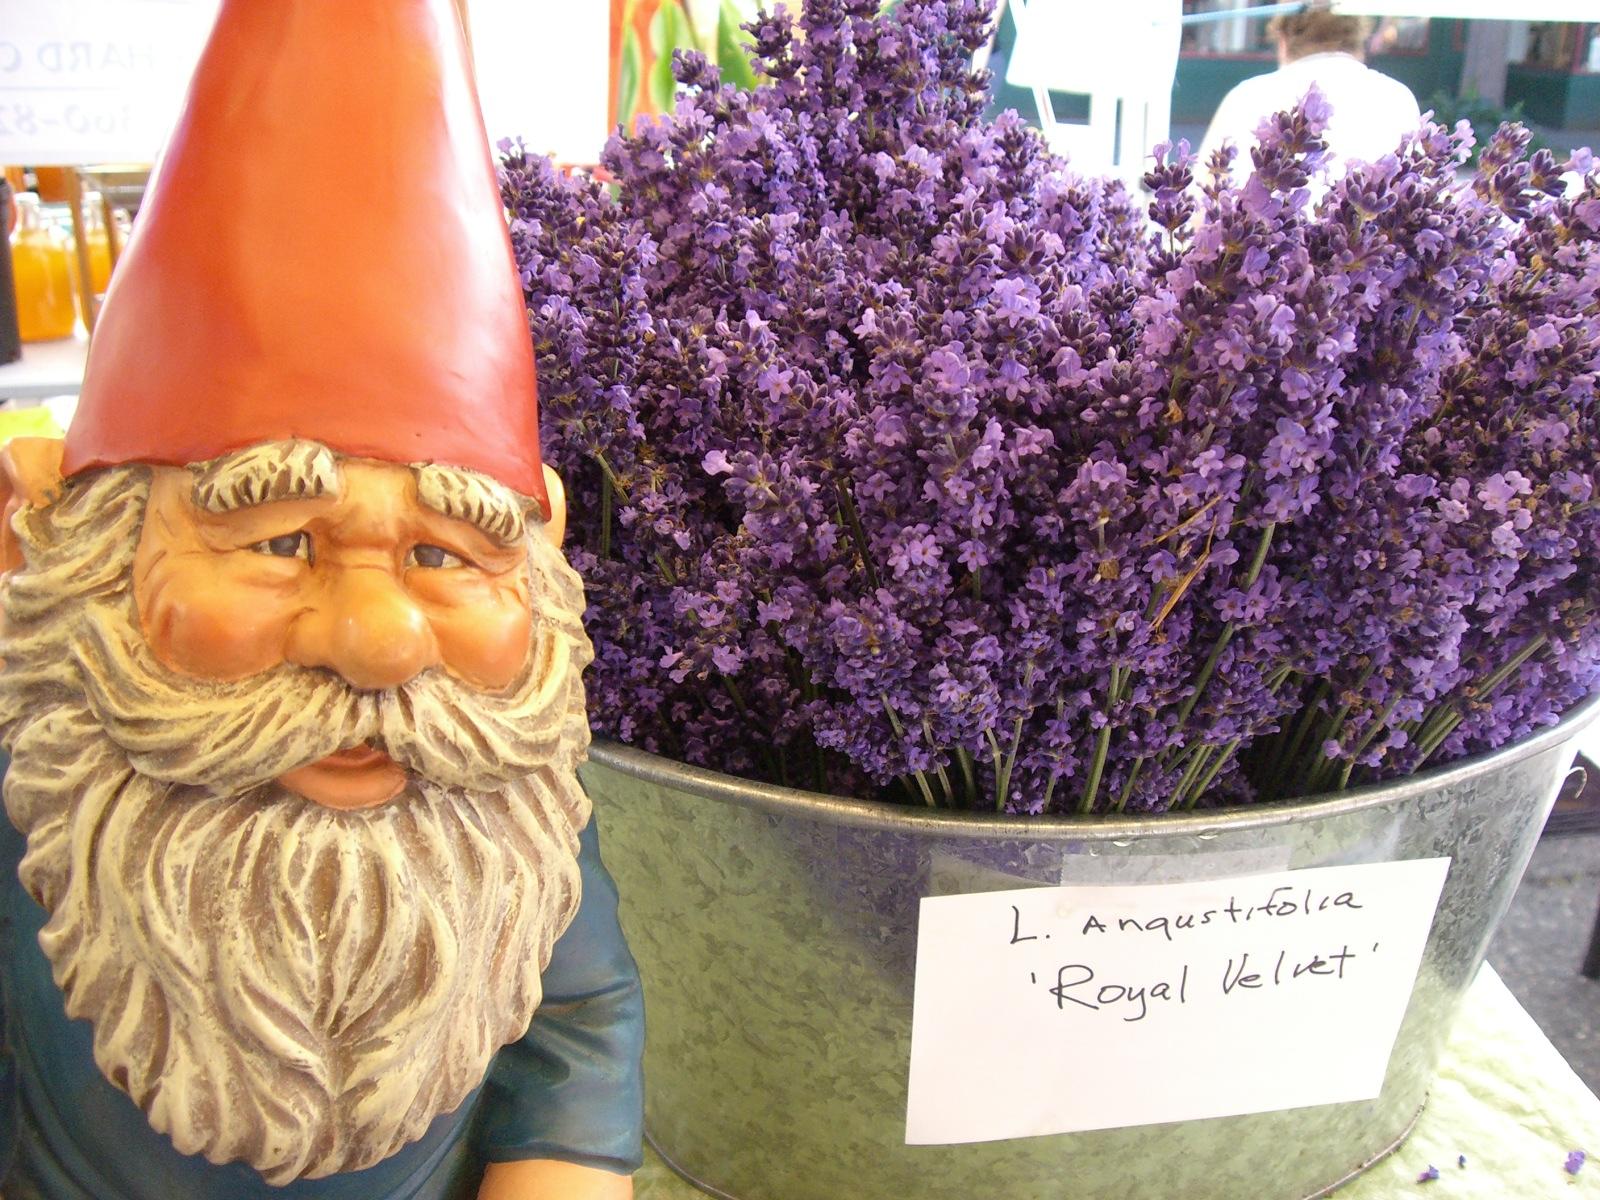 Farmers Market Lavender (LAV)